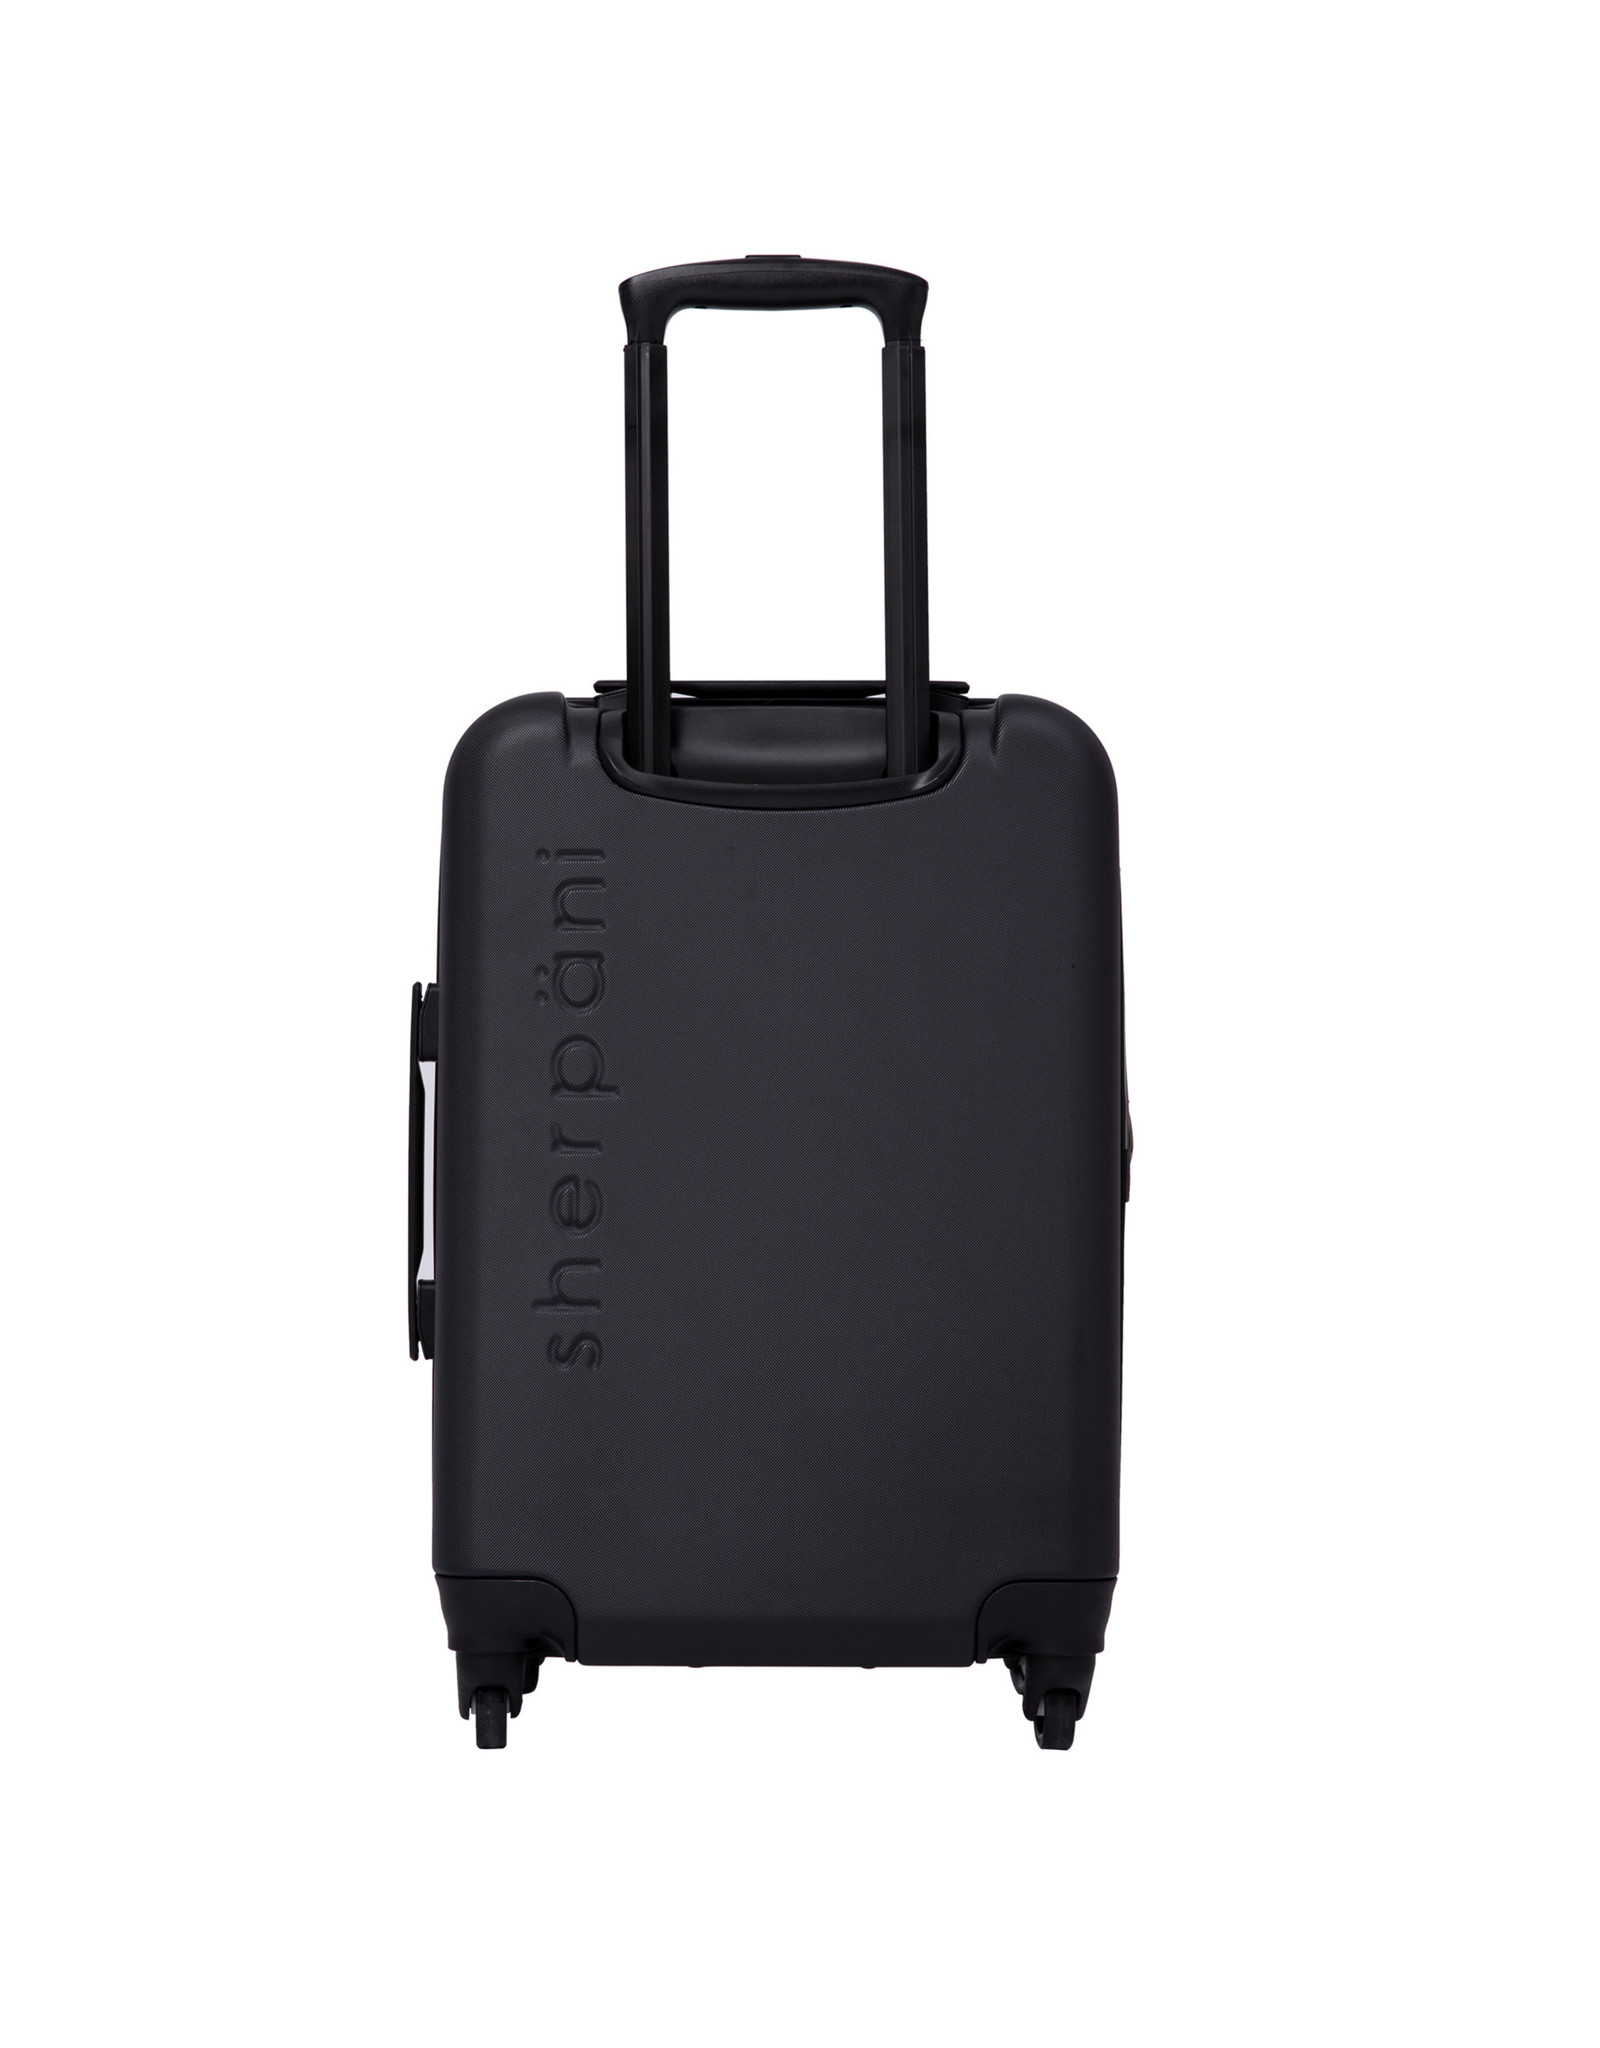 Sherpani Meridian Luggage - Black